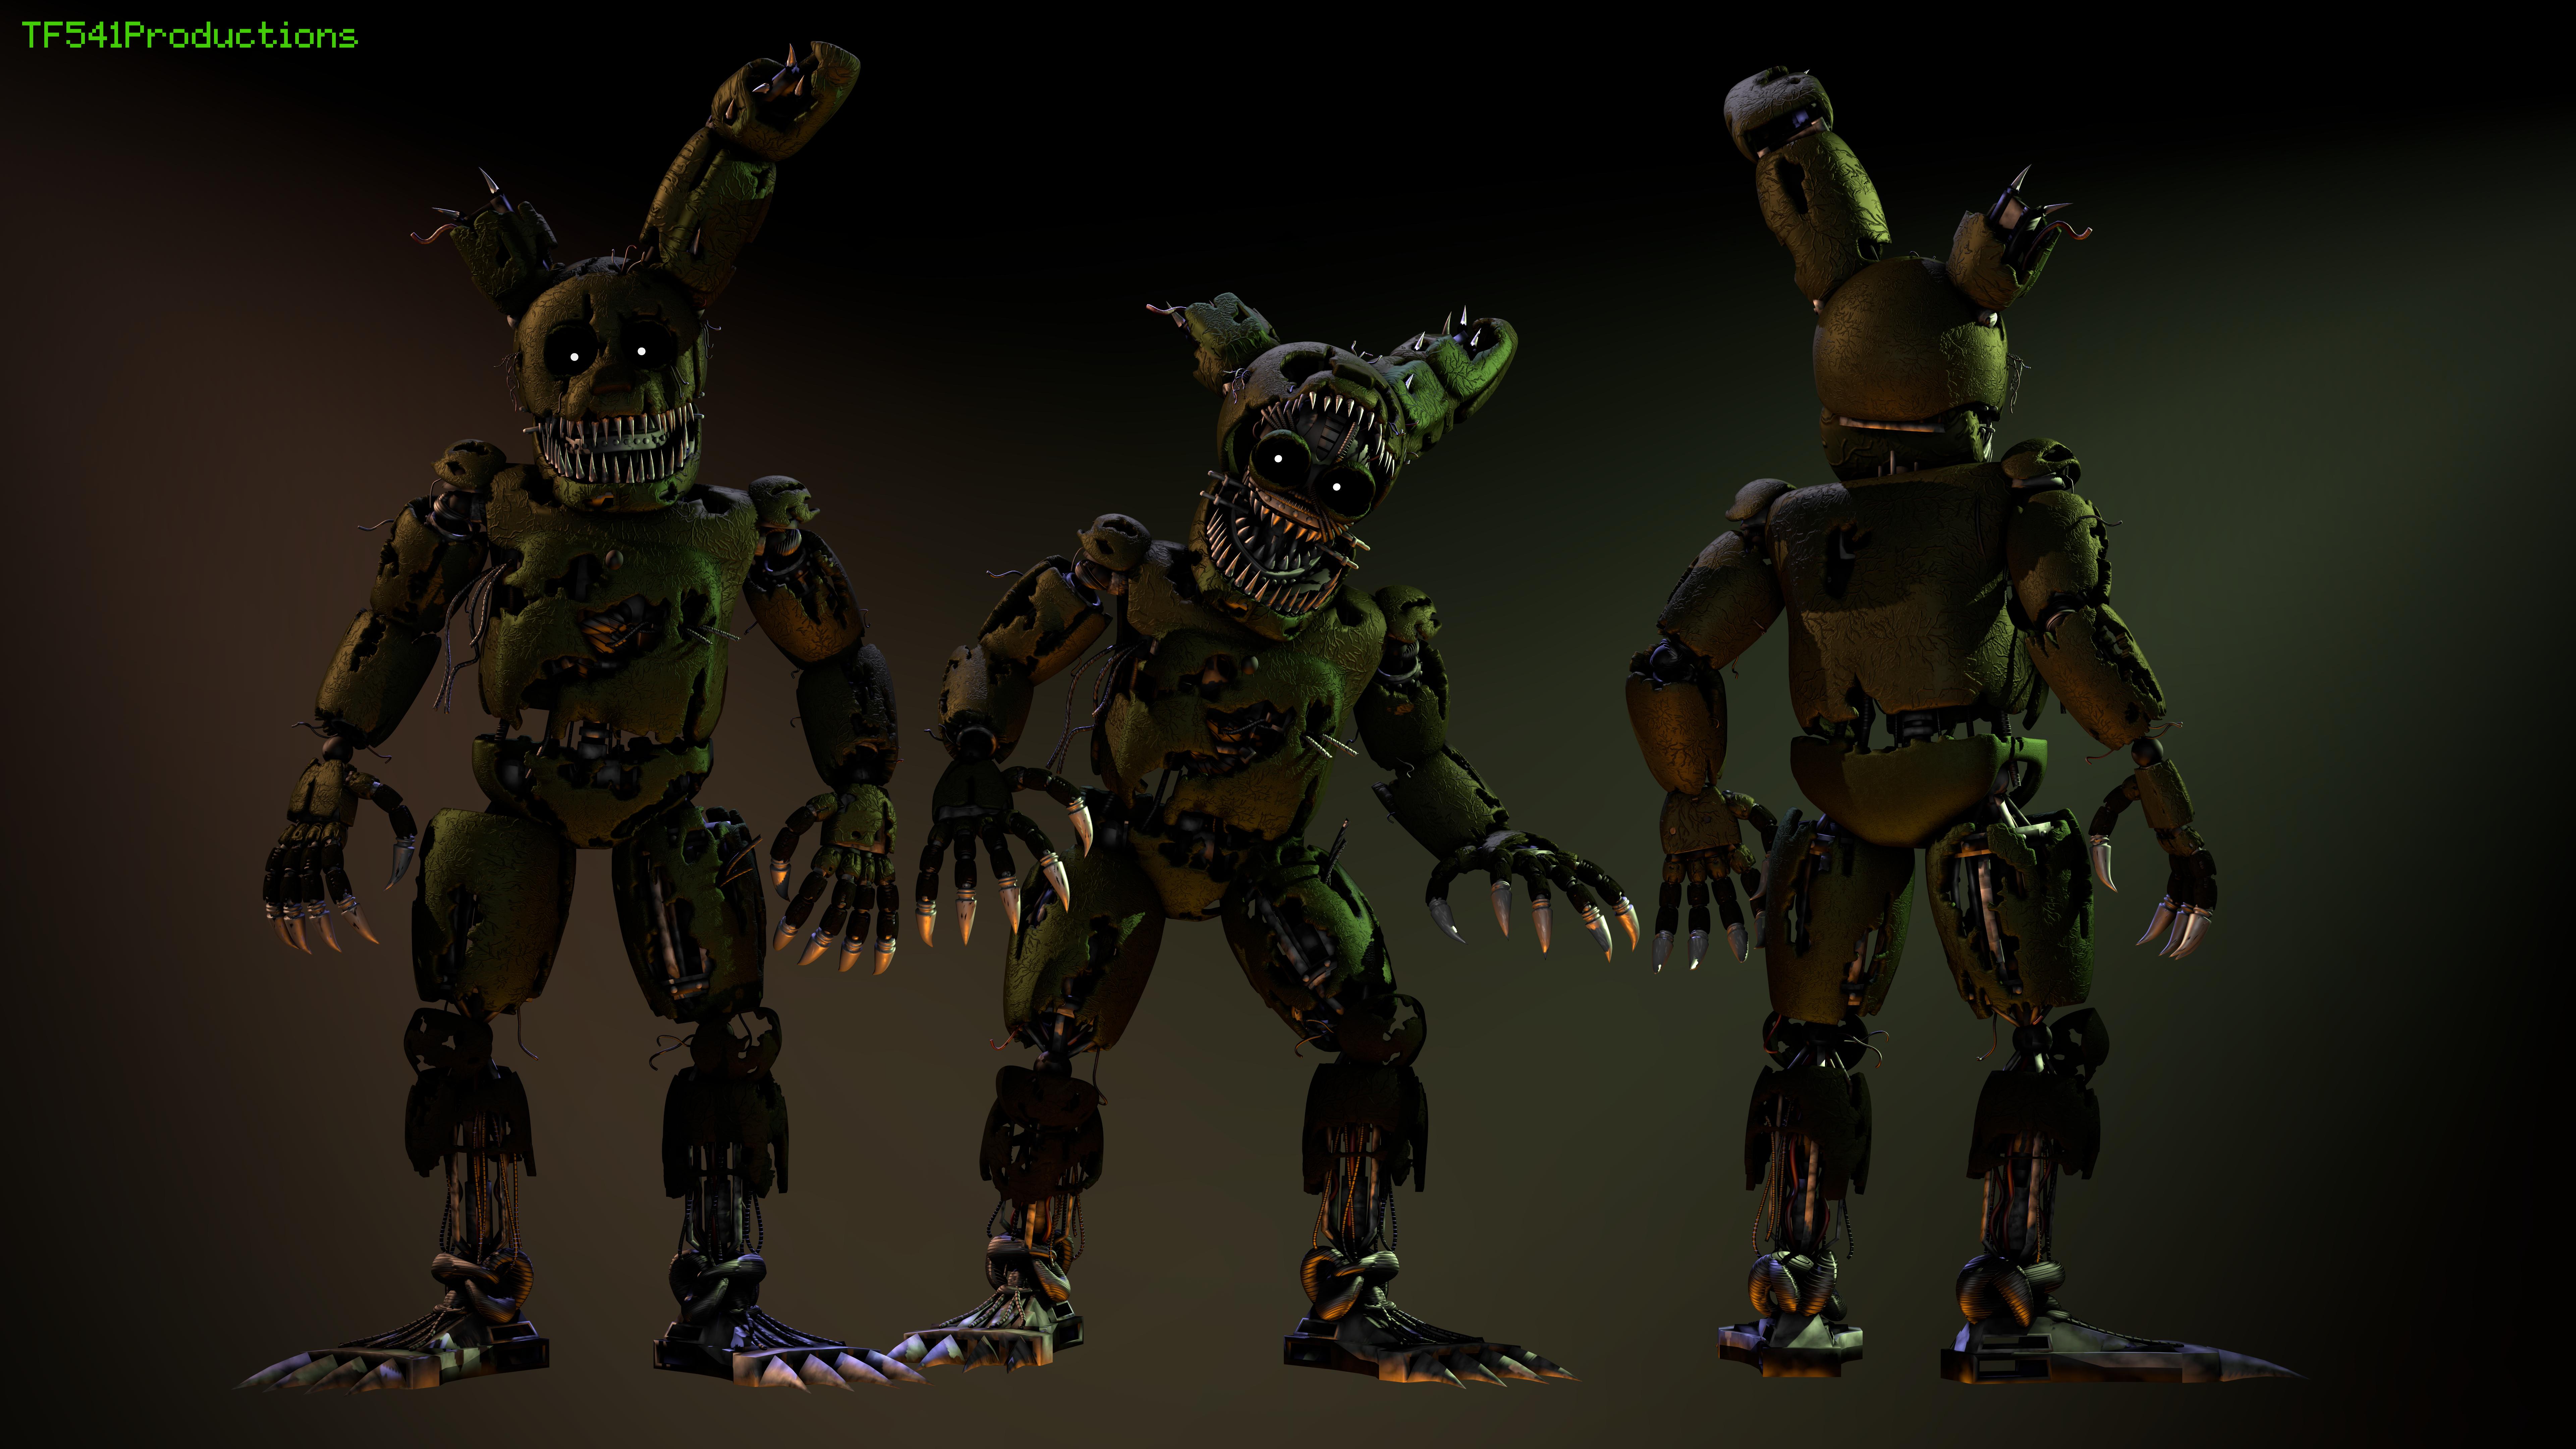 [8k] Nightmare Springtrap v2 Full Body by TF541Productions